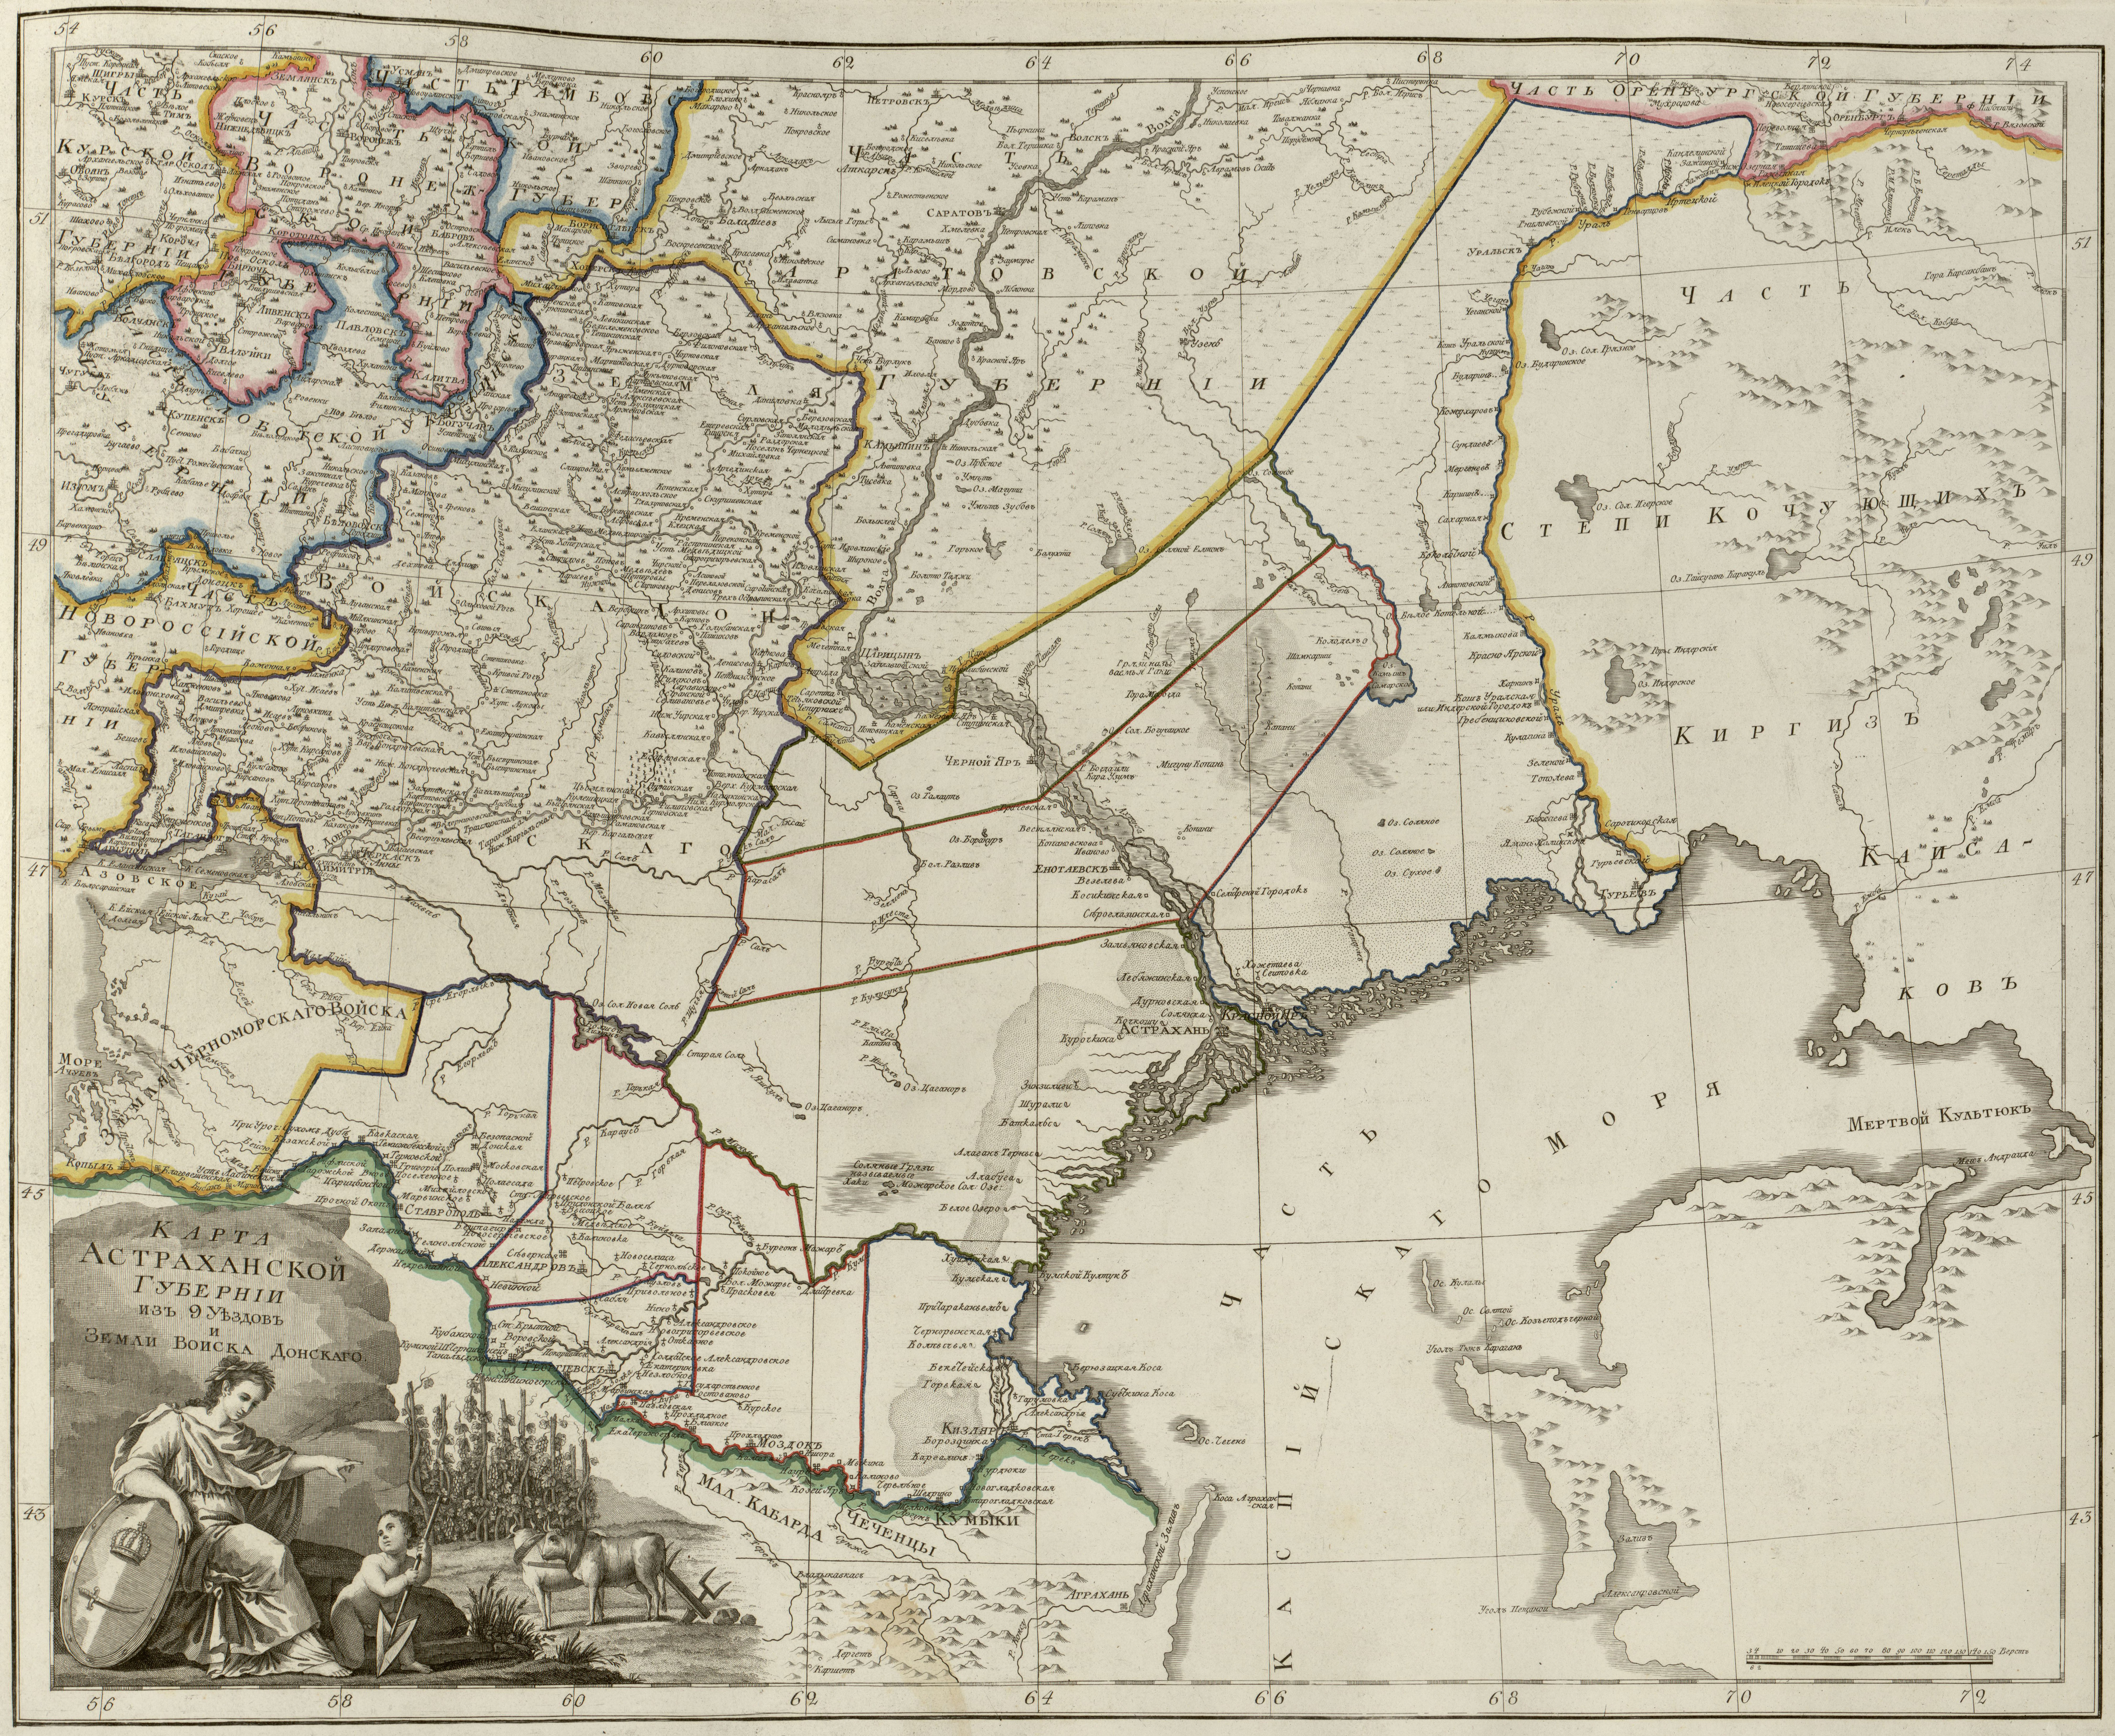 Where is Astrakhan 41